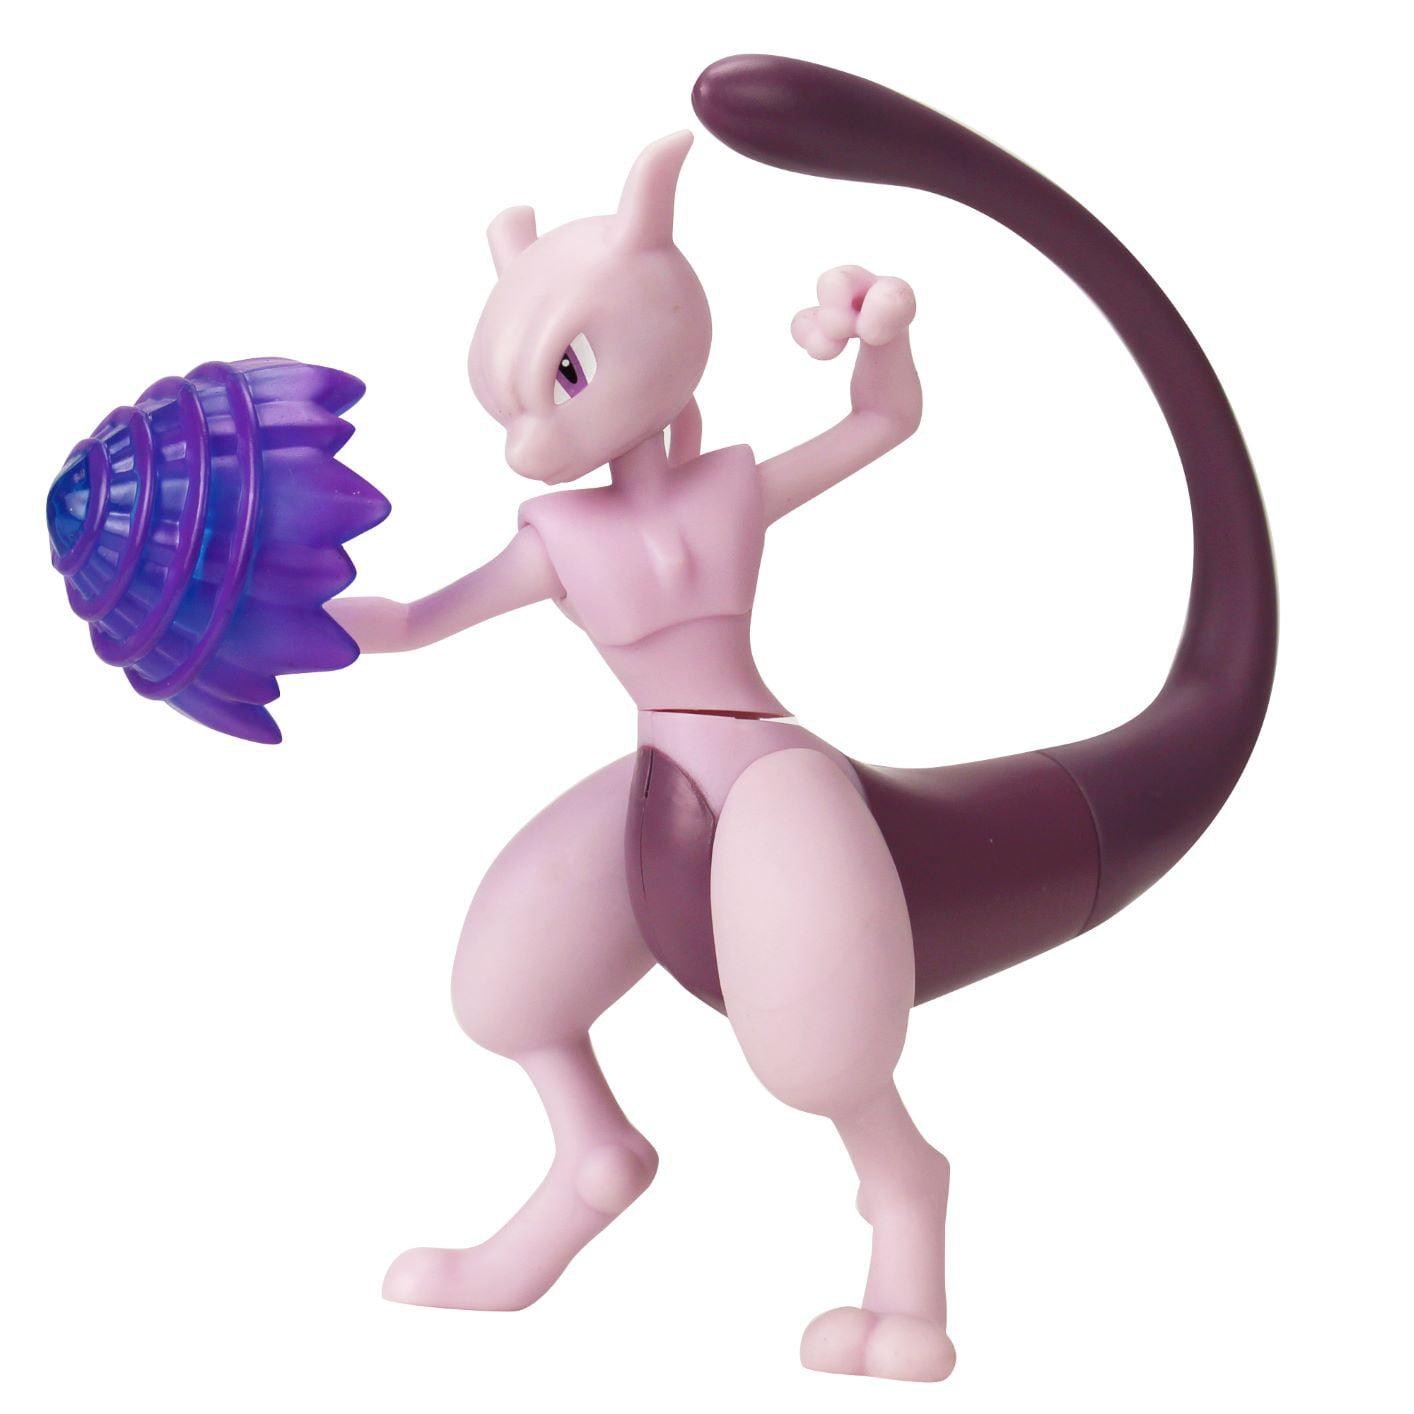 Pokemon 4.5 Inch Battle  Feature Figure Features Arrow Attack Decidueye